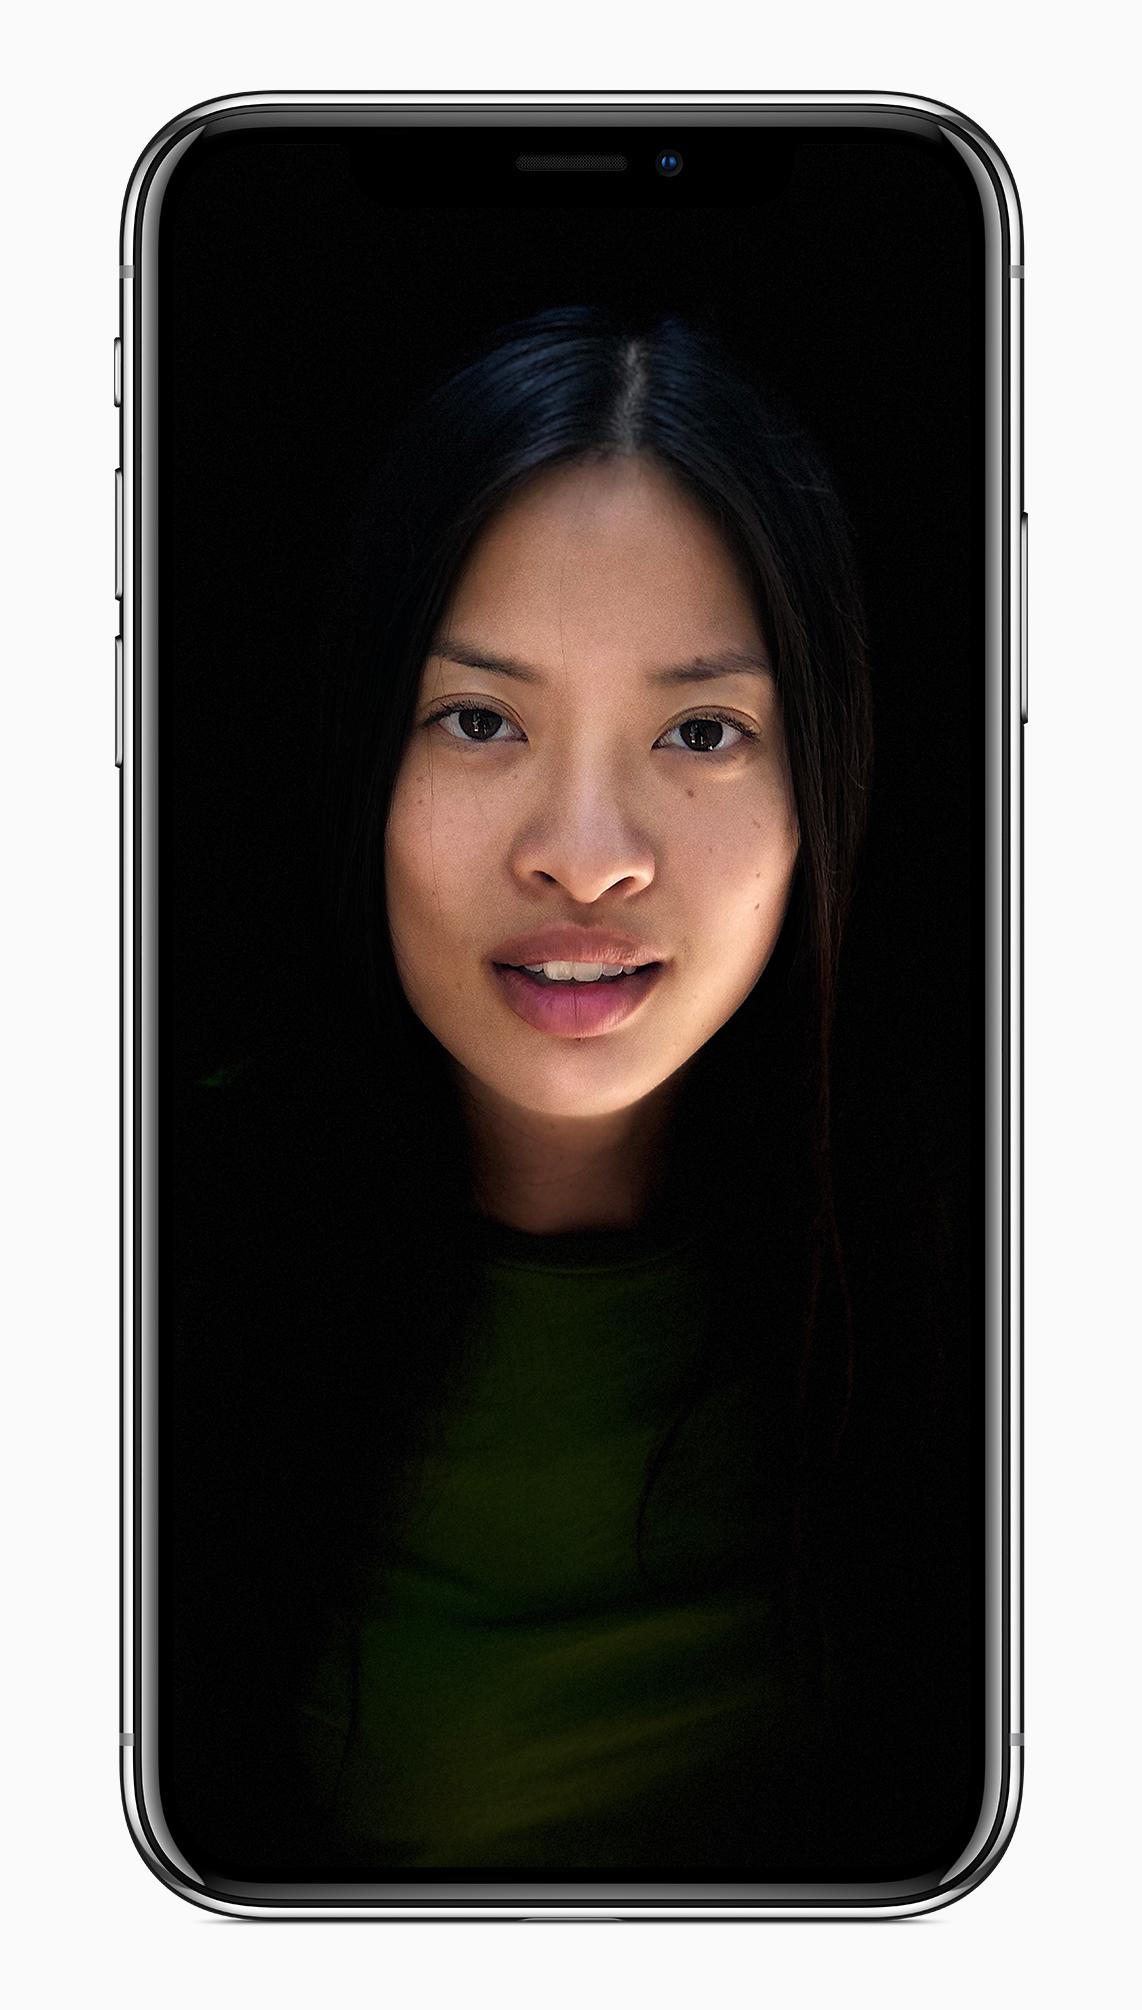 iphonex_camera_front_lighting_four.jpg